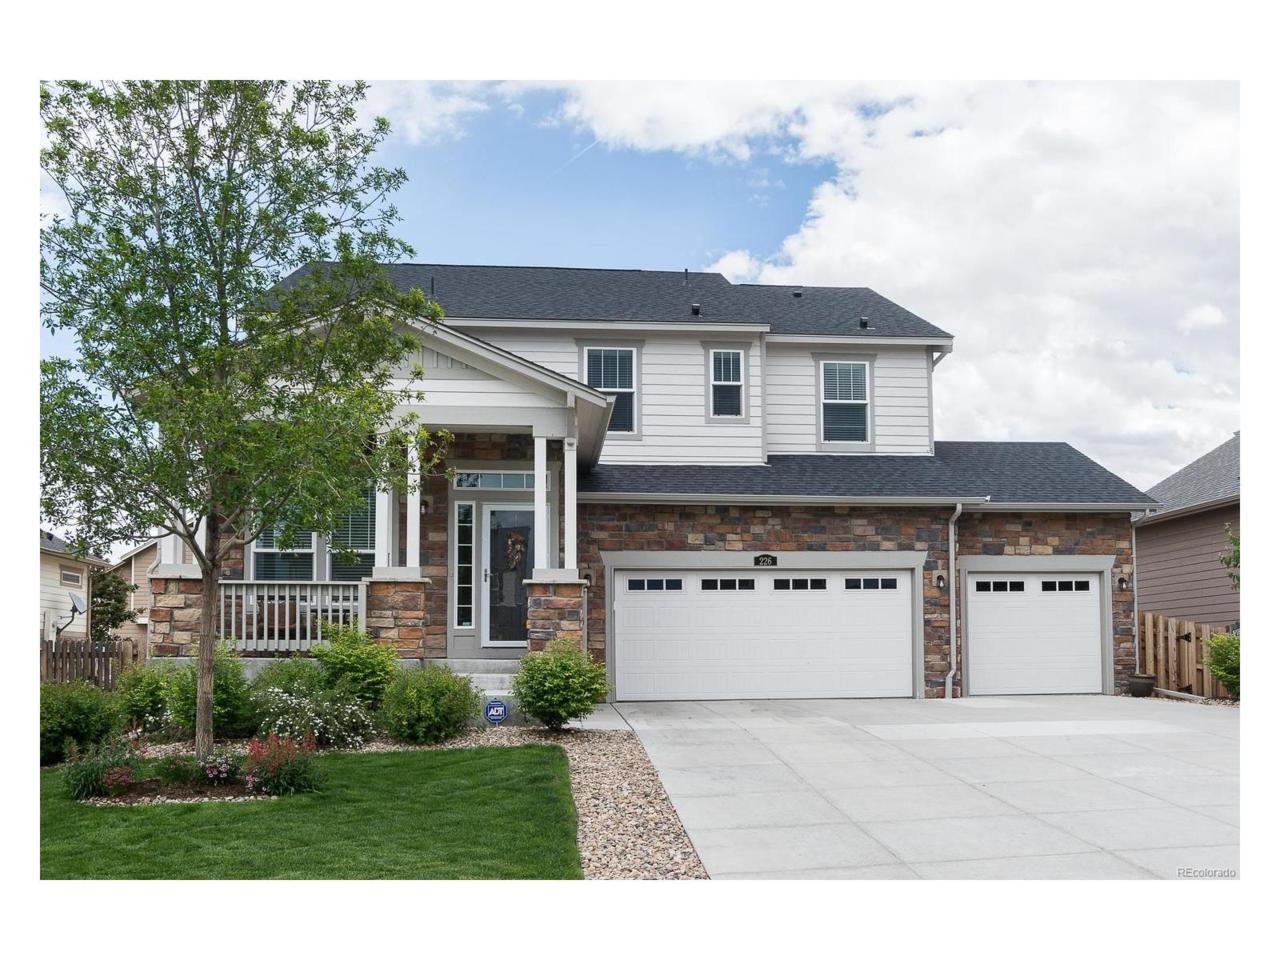 226 N Millbrook Street, Aurora, CO 80018 (MLS #8768628) :: 8z Real Estate